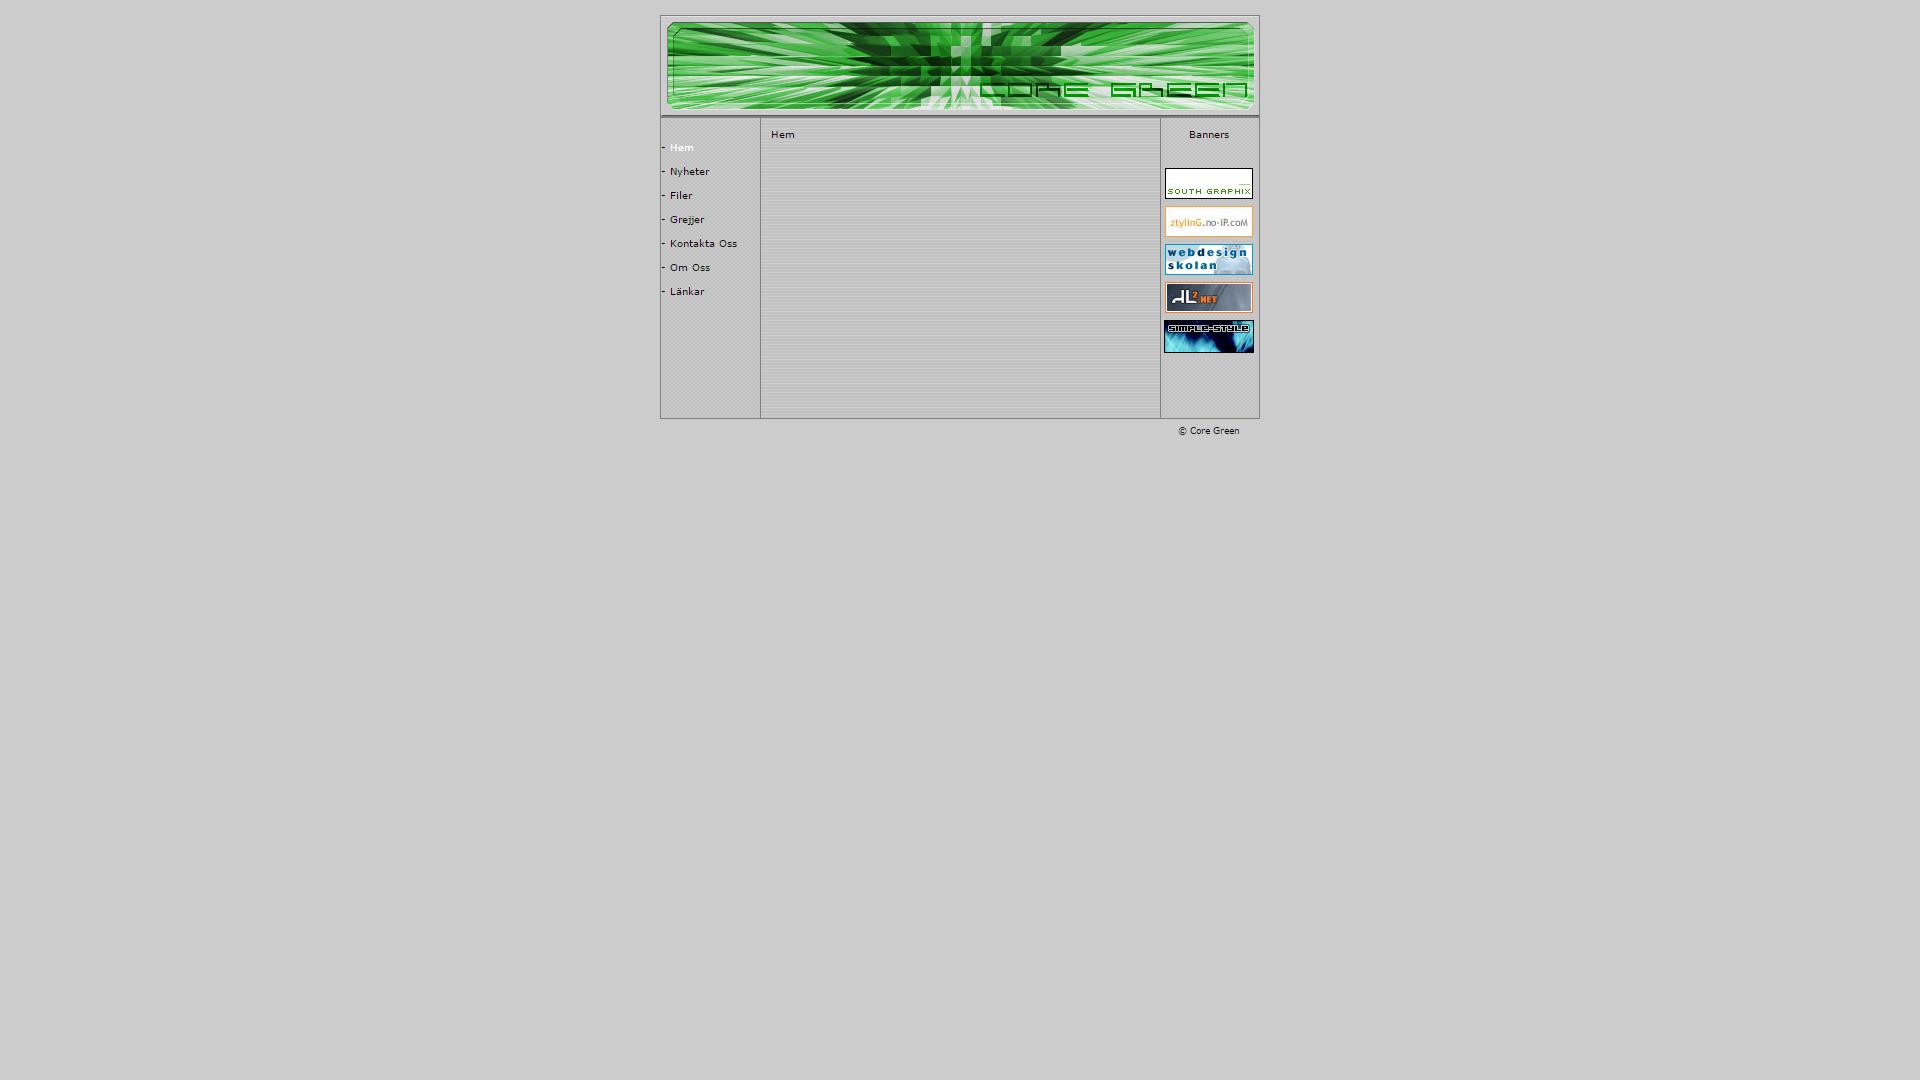 core-green/assets/images/screenshot.png